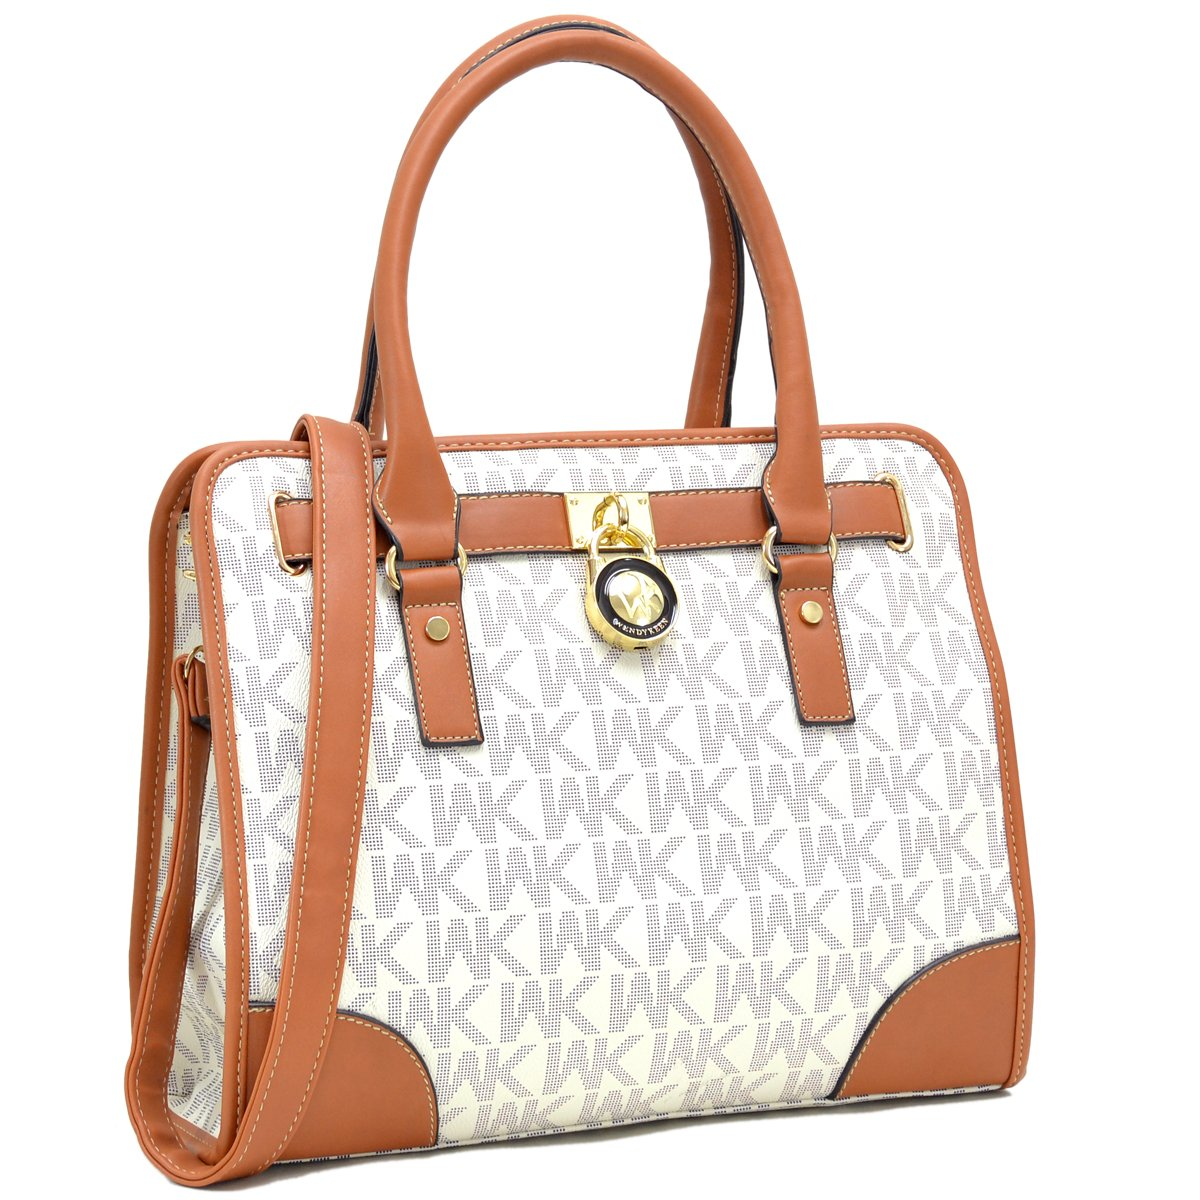 Medium Satchel Purse Designer Handbag Top Handle Shoulder Bag Padlock Brown/White